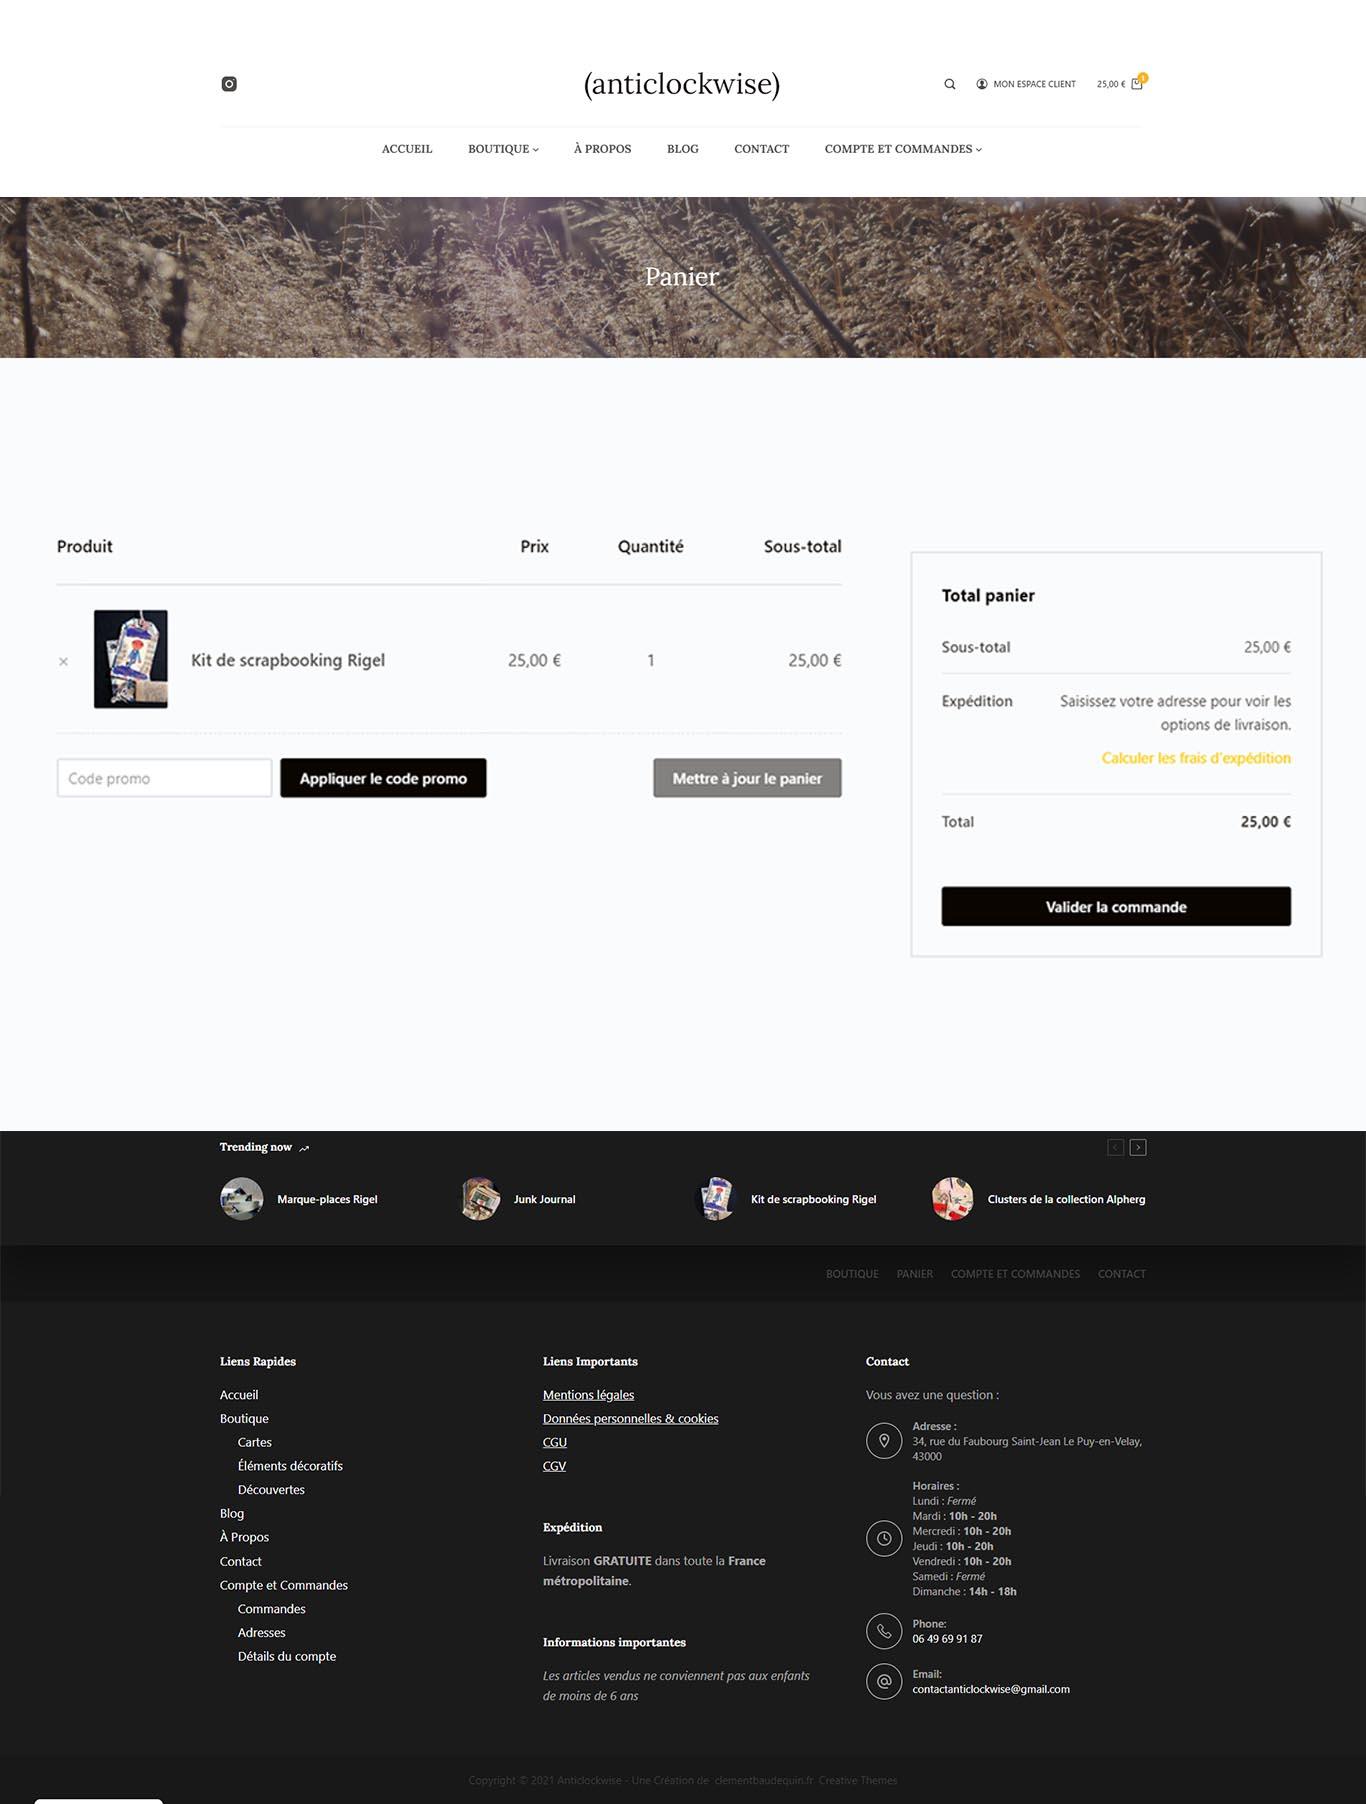 pannier_Anticlockwise_presentation_création_site_internet_albi